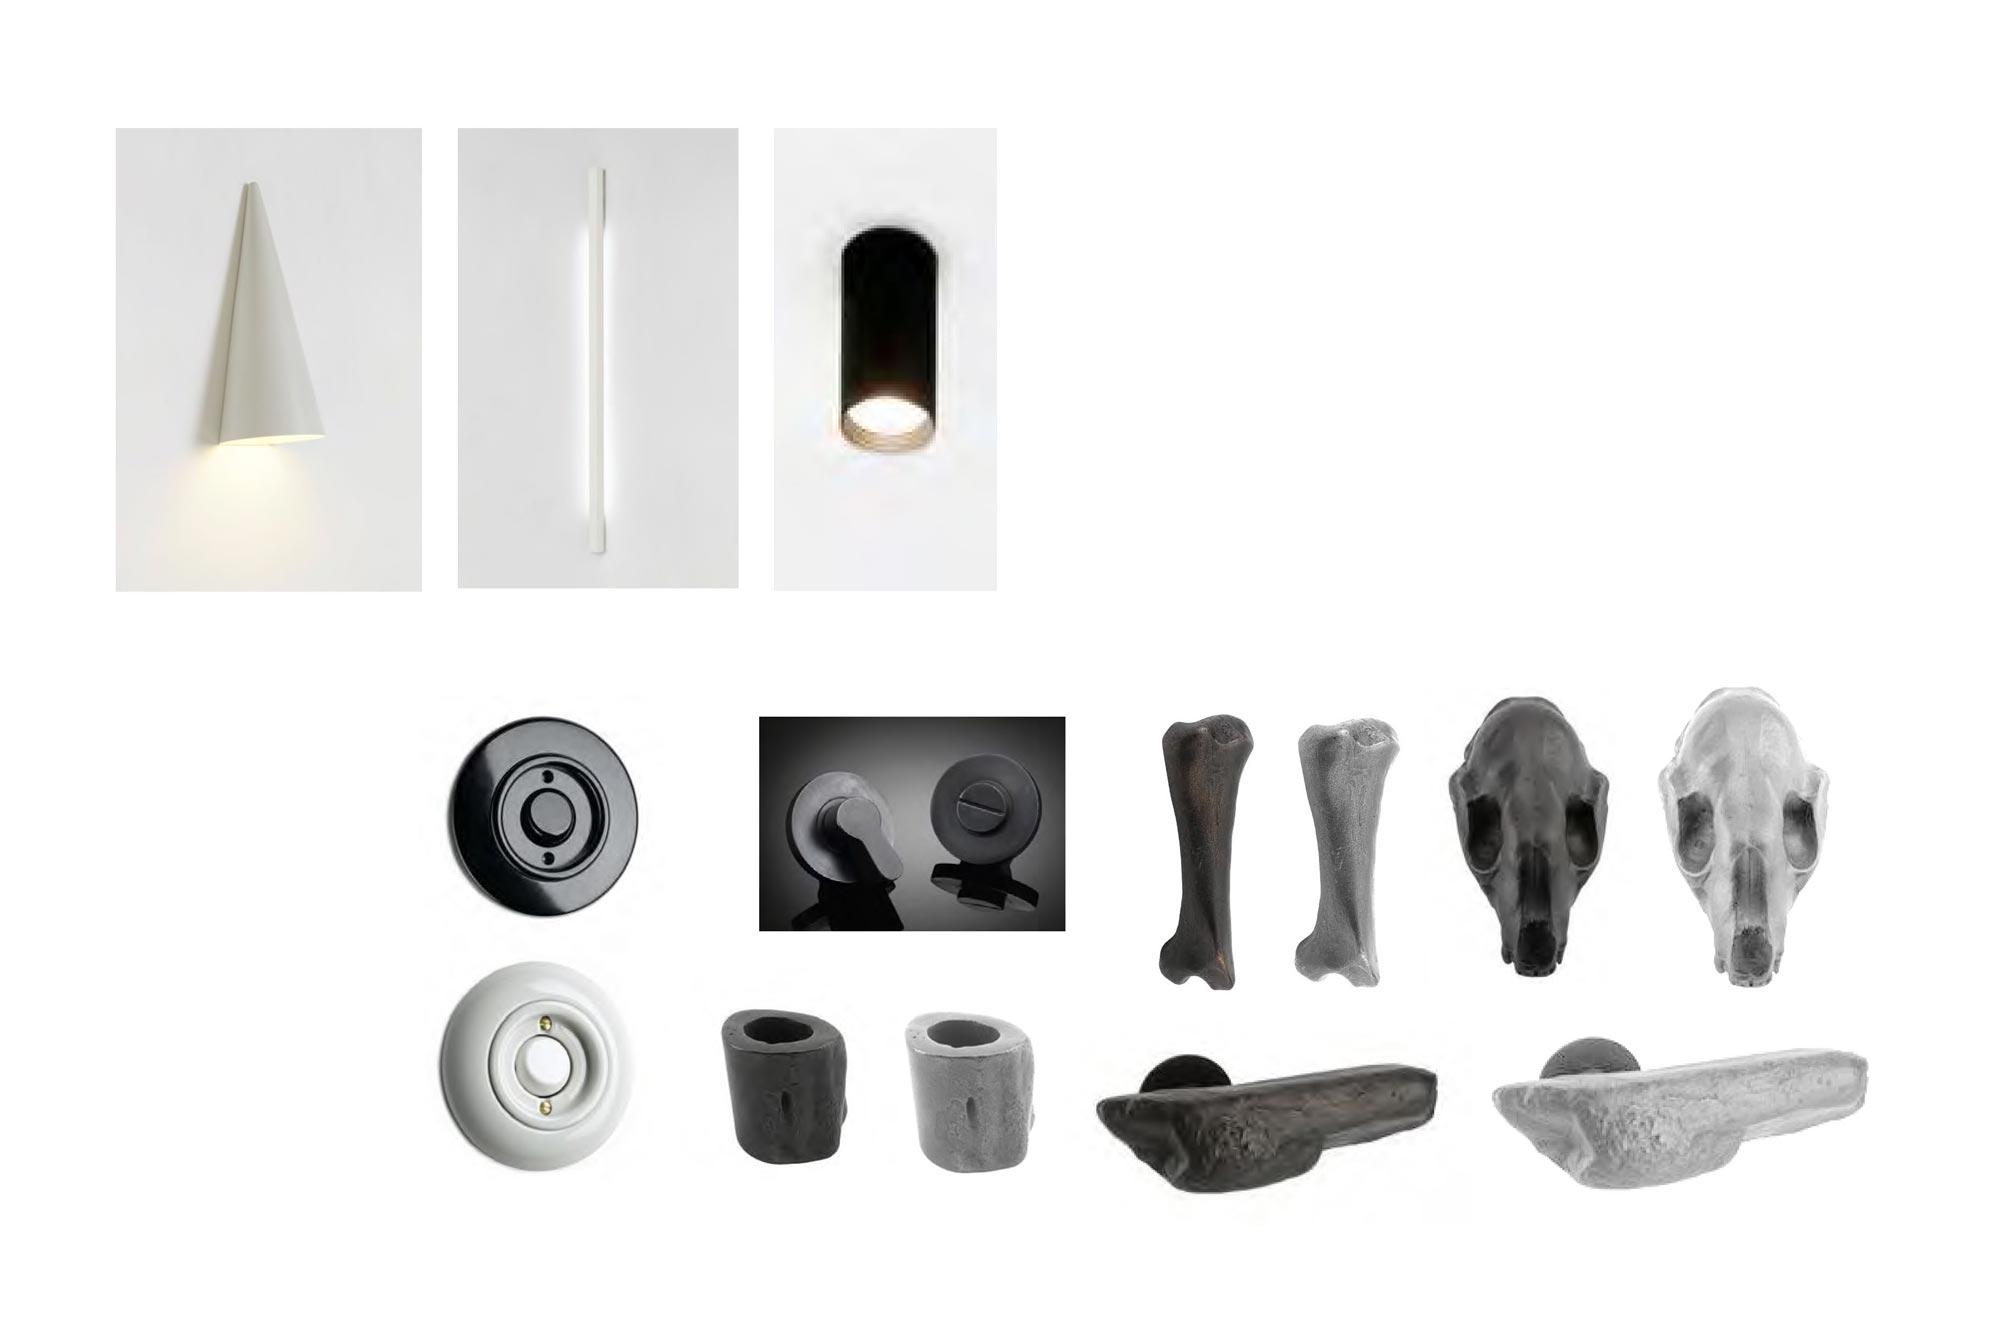 cube-haus-faye-toogood-architects-cs-2000px-08